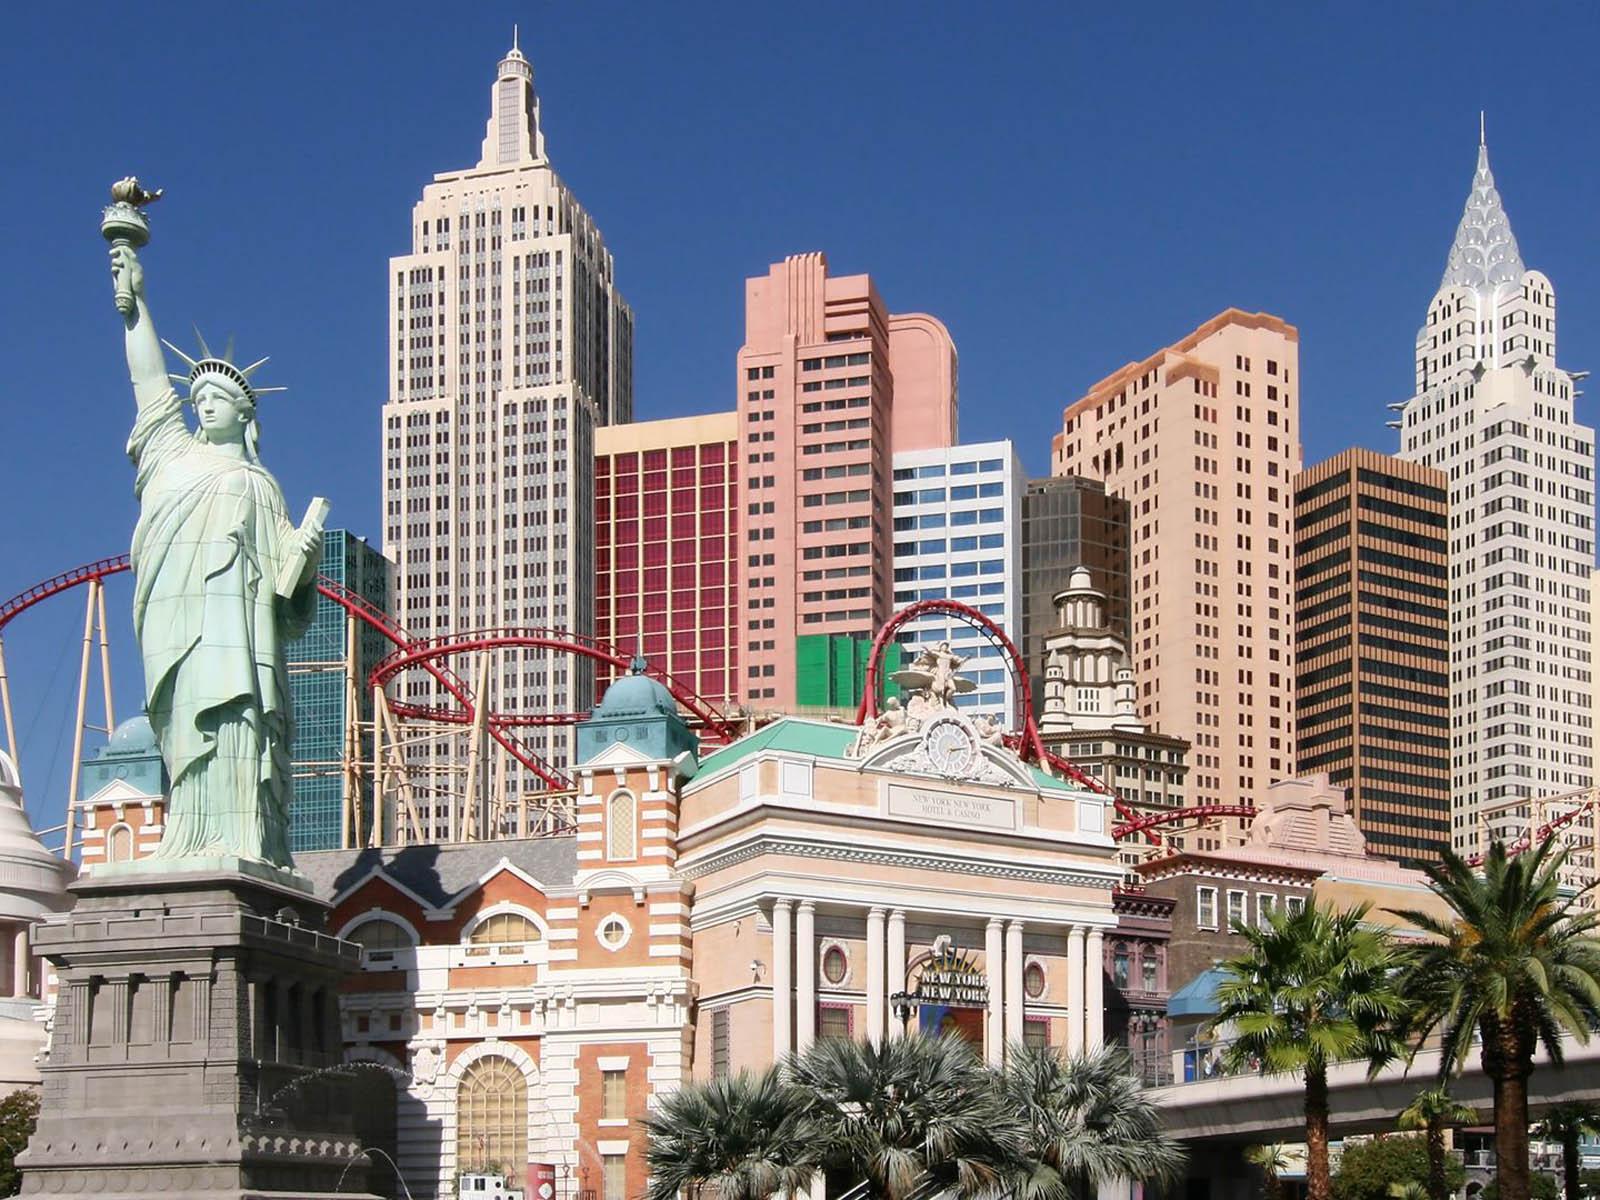 http://3.bp.blogspot.com/-zBtaPIIJwoE/T-khMpmbsXI/AAAAAAAAEoc/08F7FCcD7Oc/s1600/Las+Vegas+Nevada.jpg